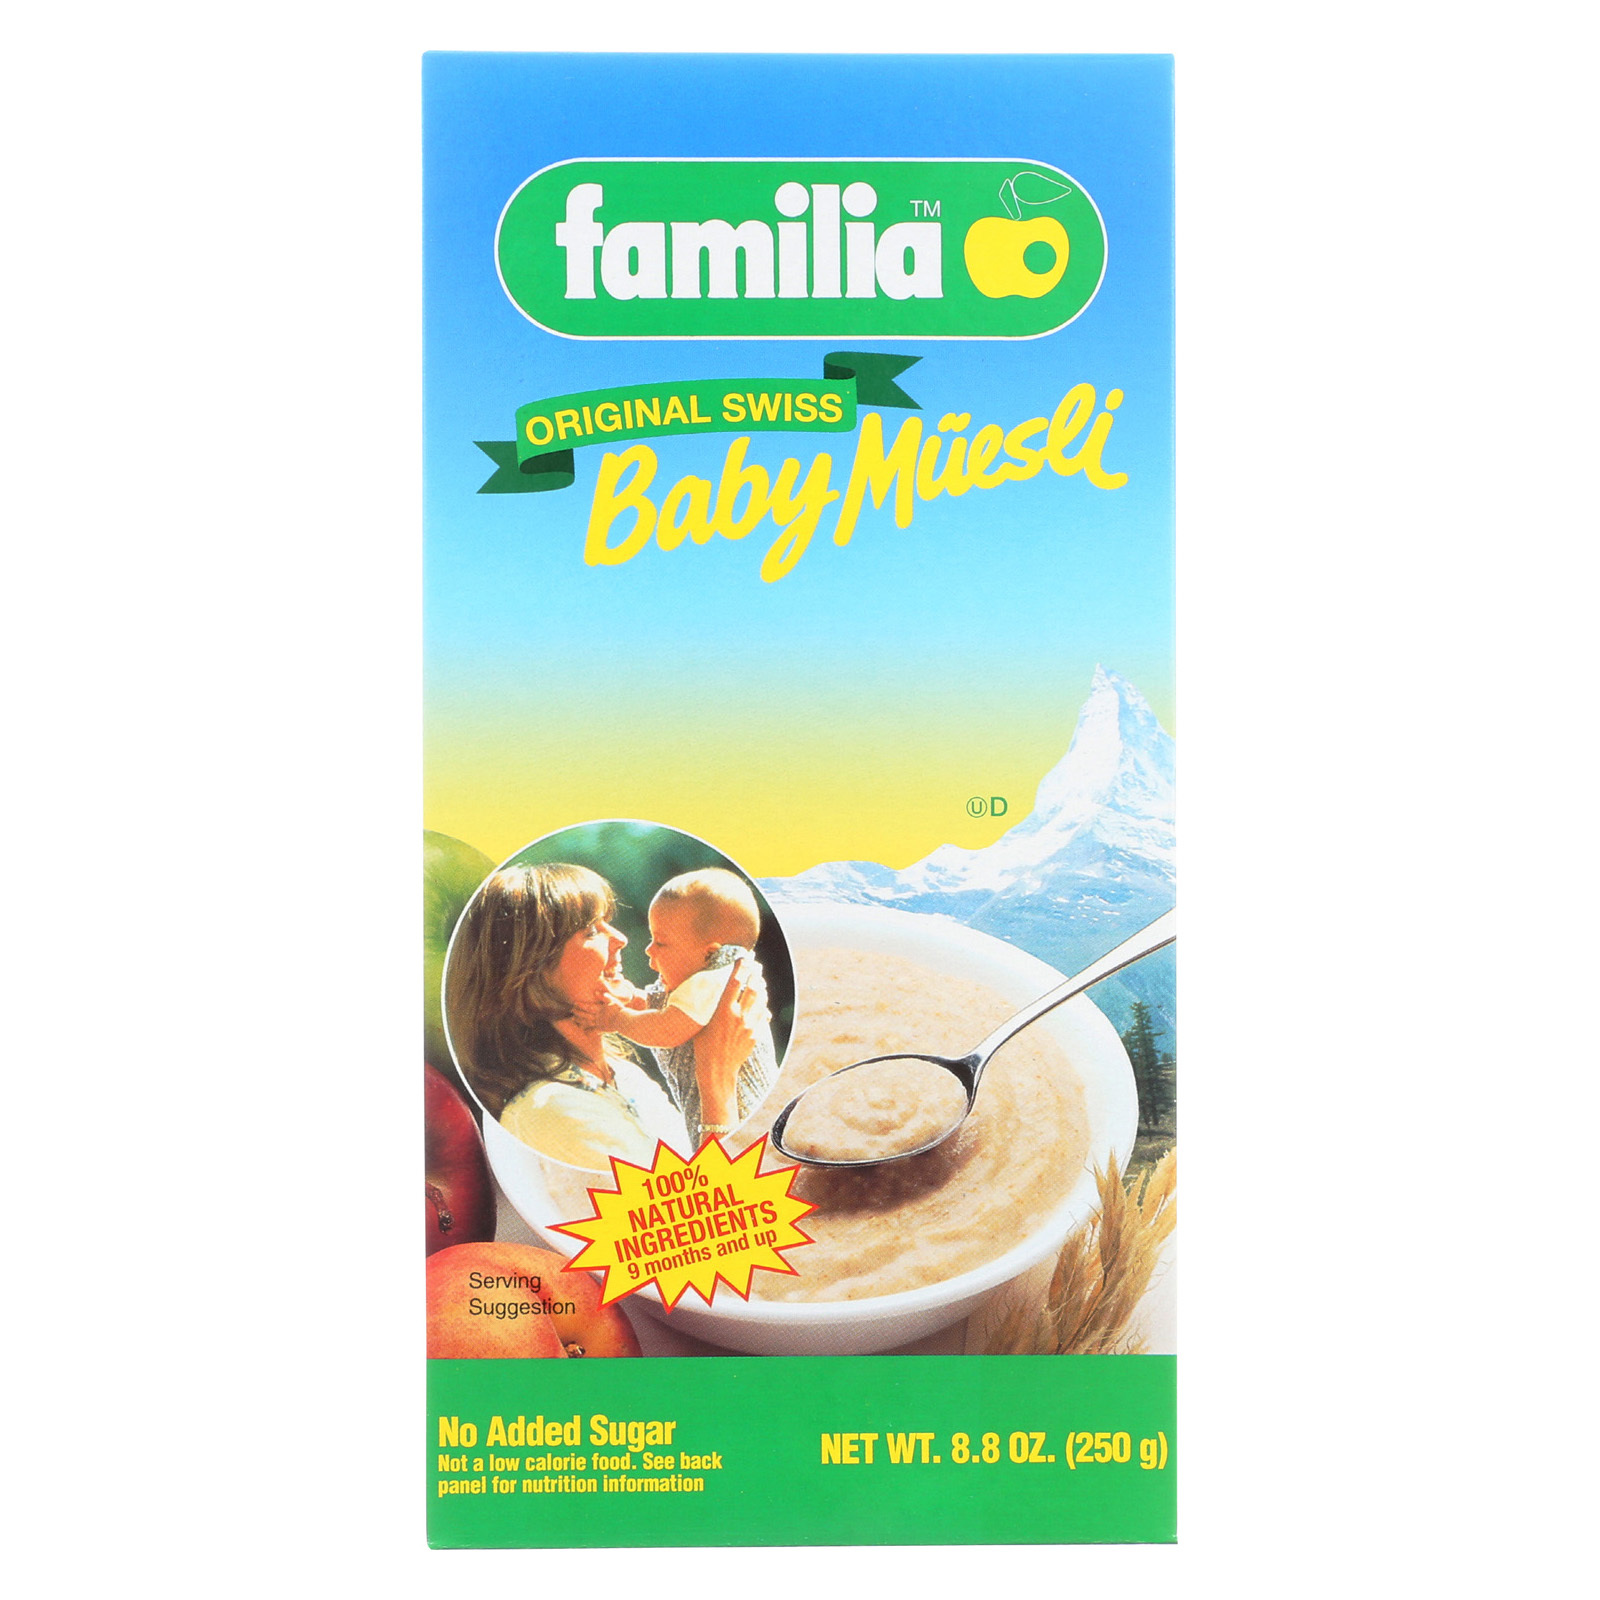 Familia Baby Muesli - Original Swiss - Case of 6 - 8.8 oz